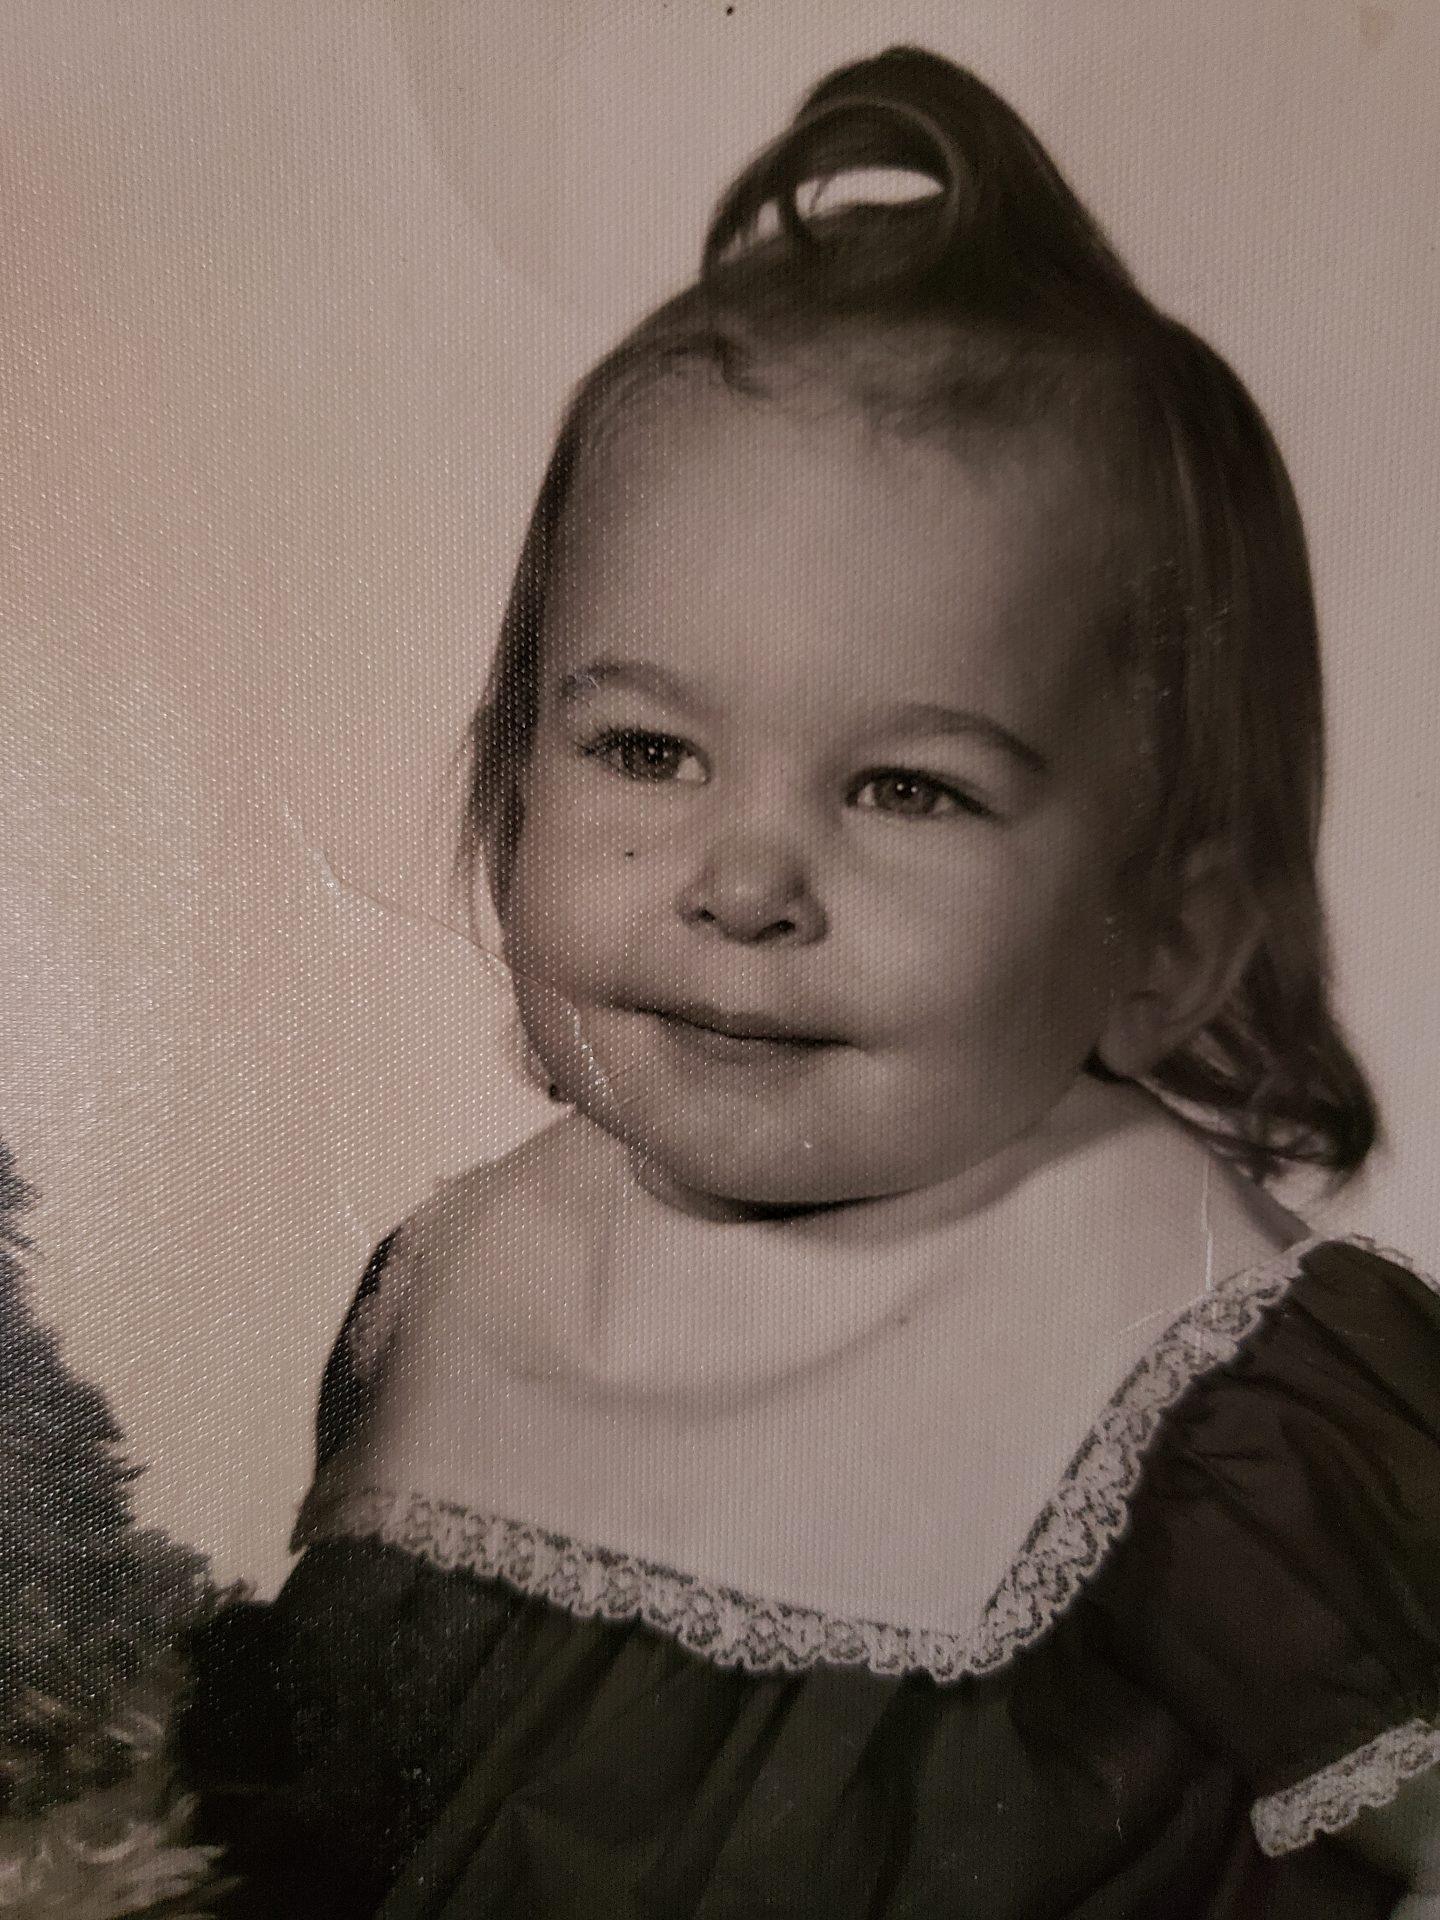 Barbara at age 18 months